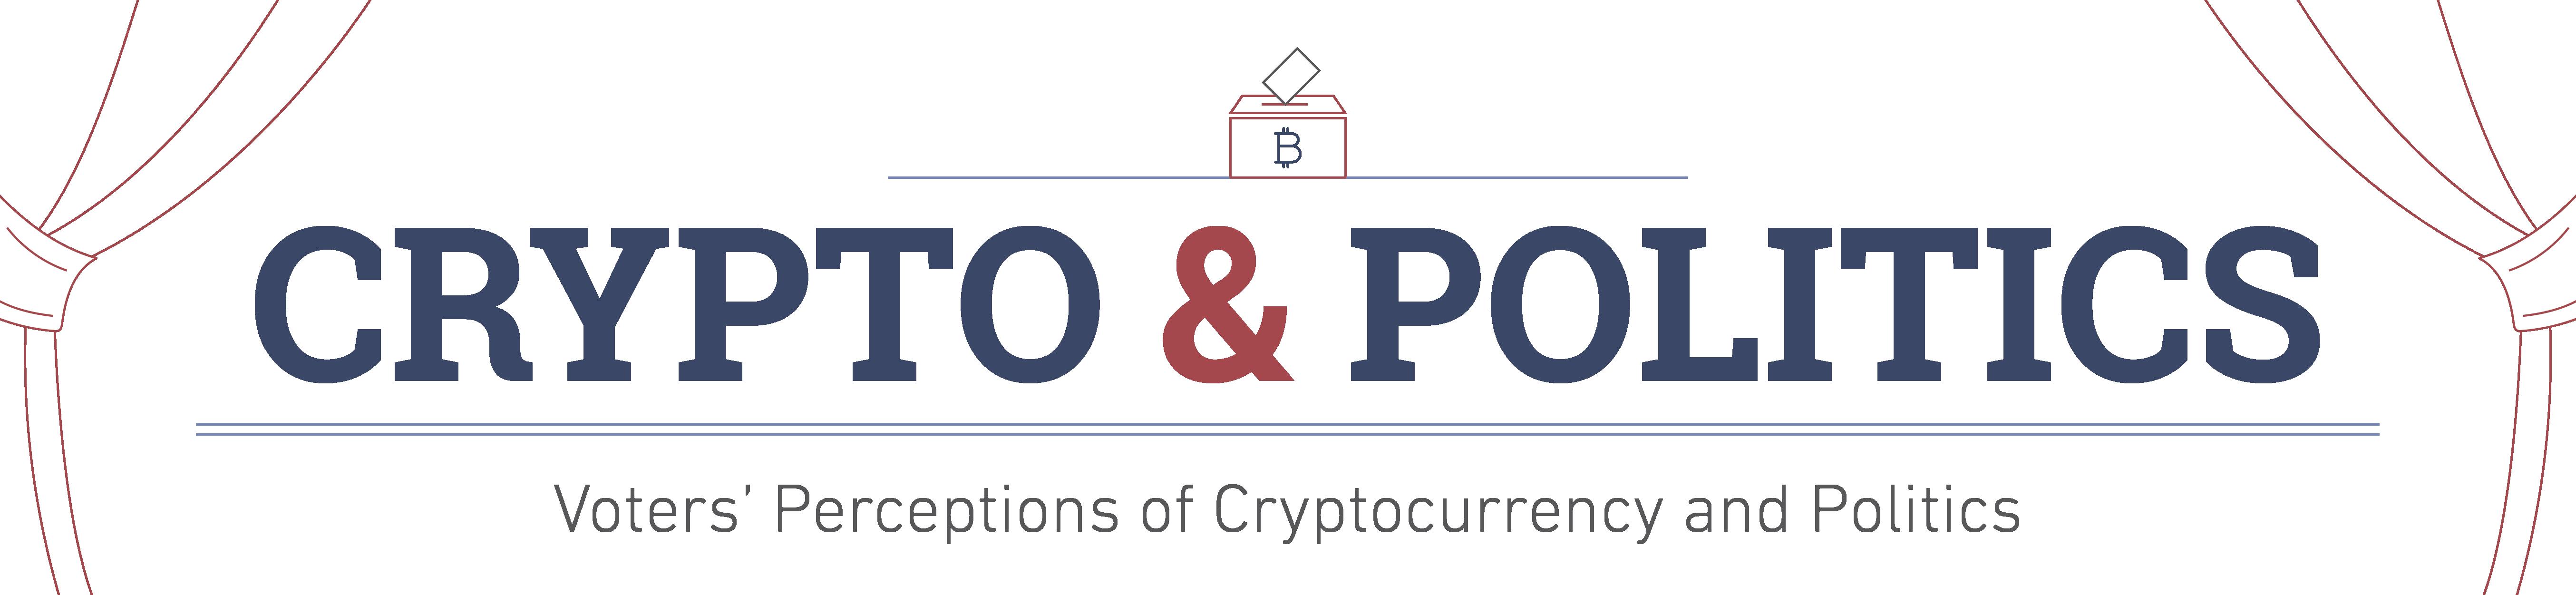 crypto-politics-header